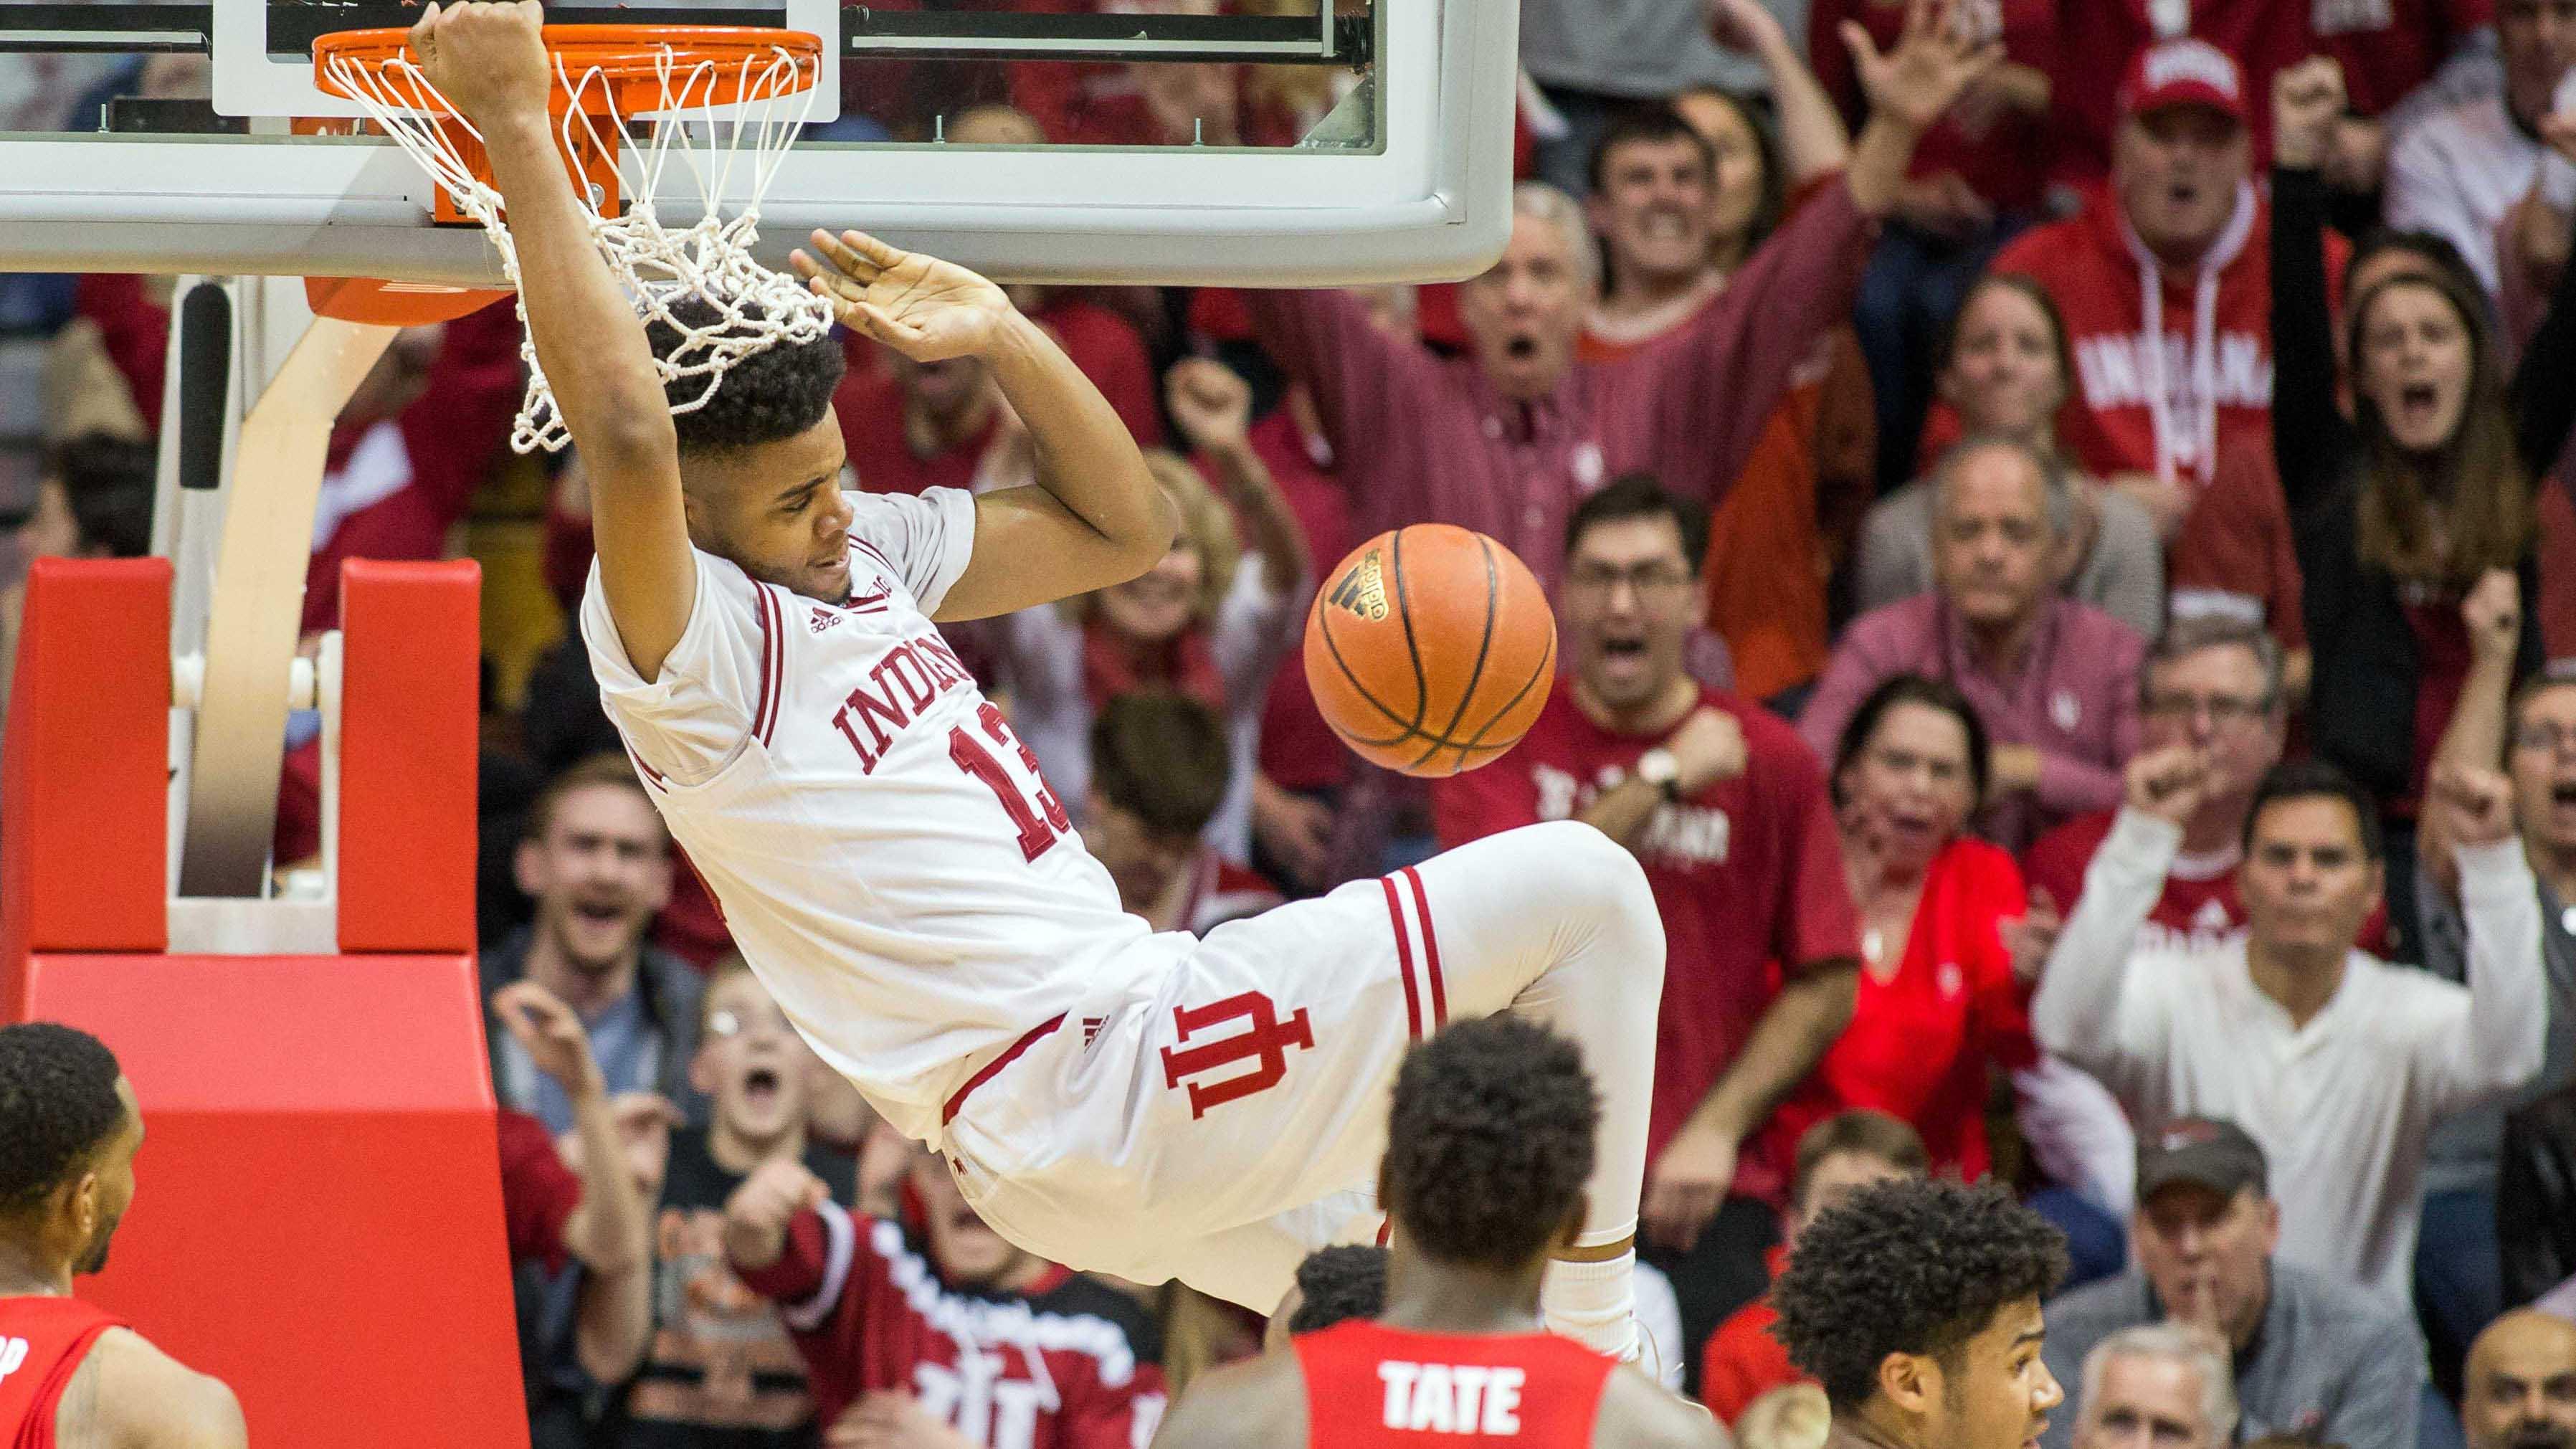 Indiana's Juwan Morgan dunks on Ohio State